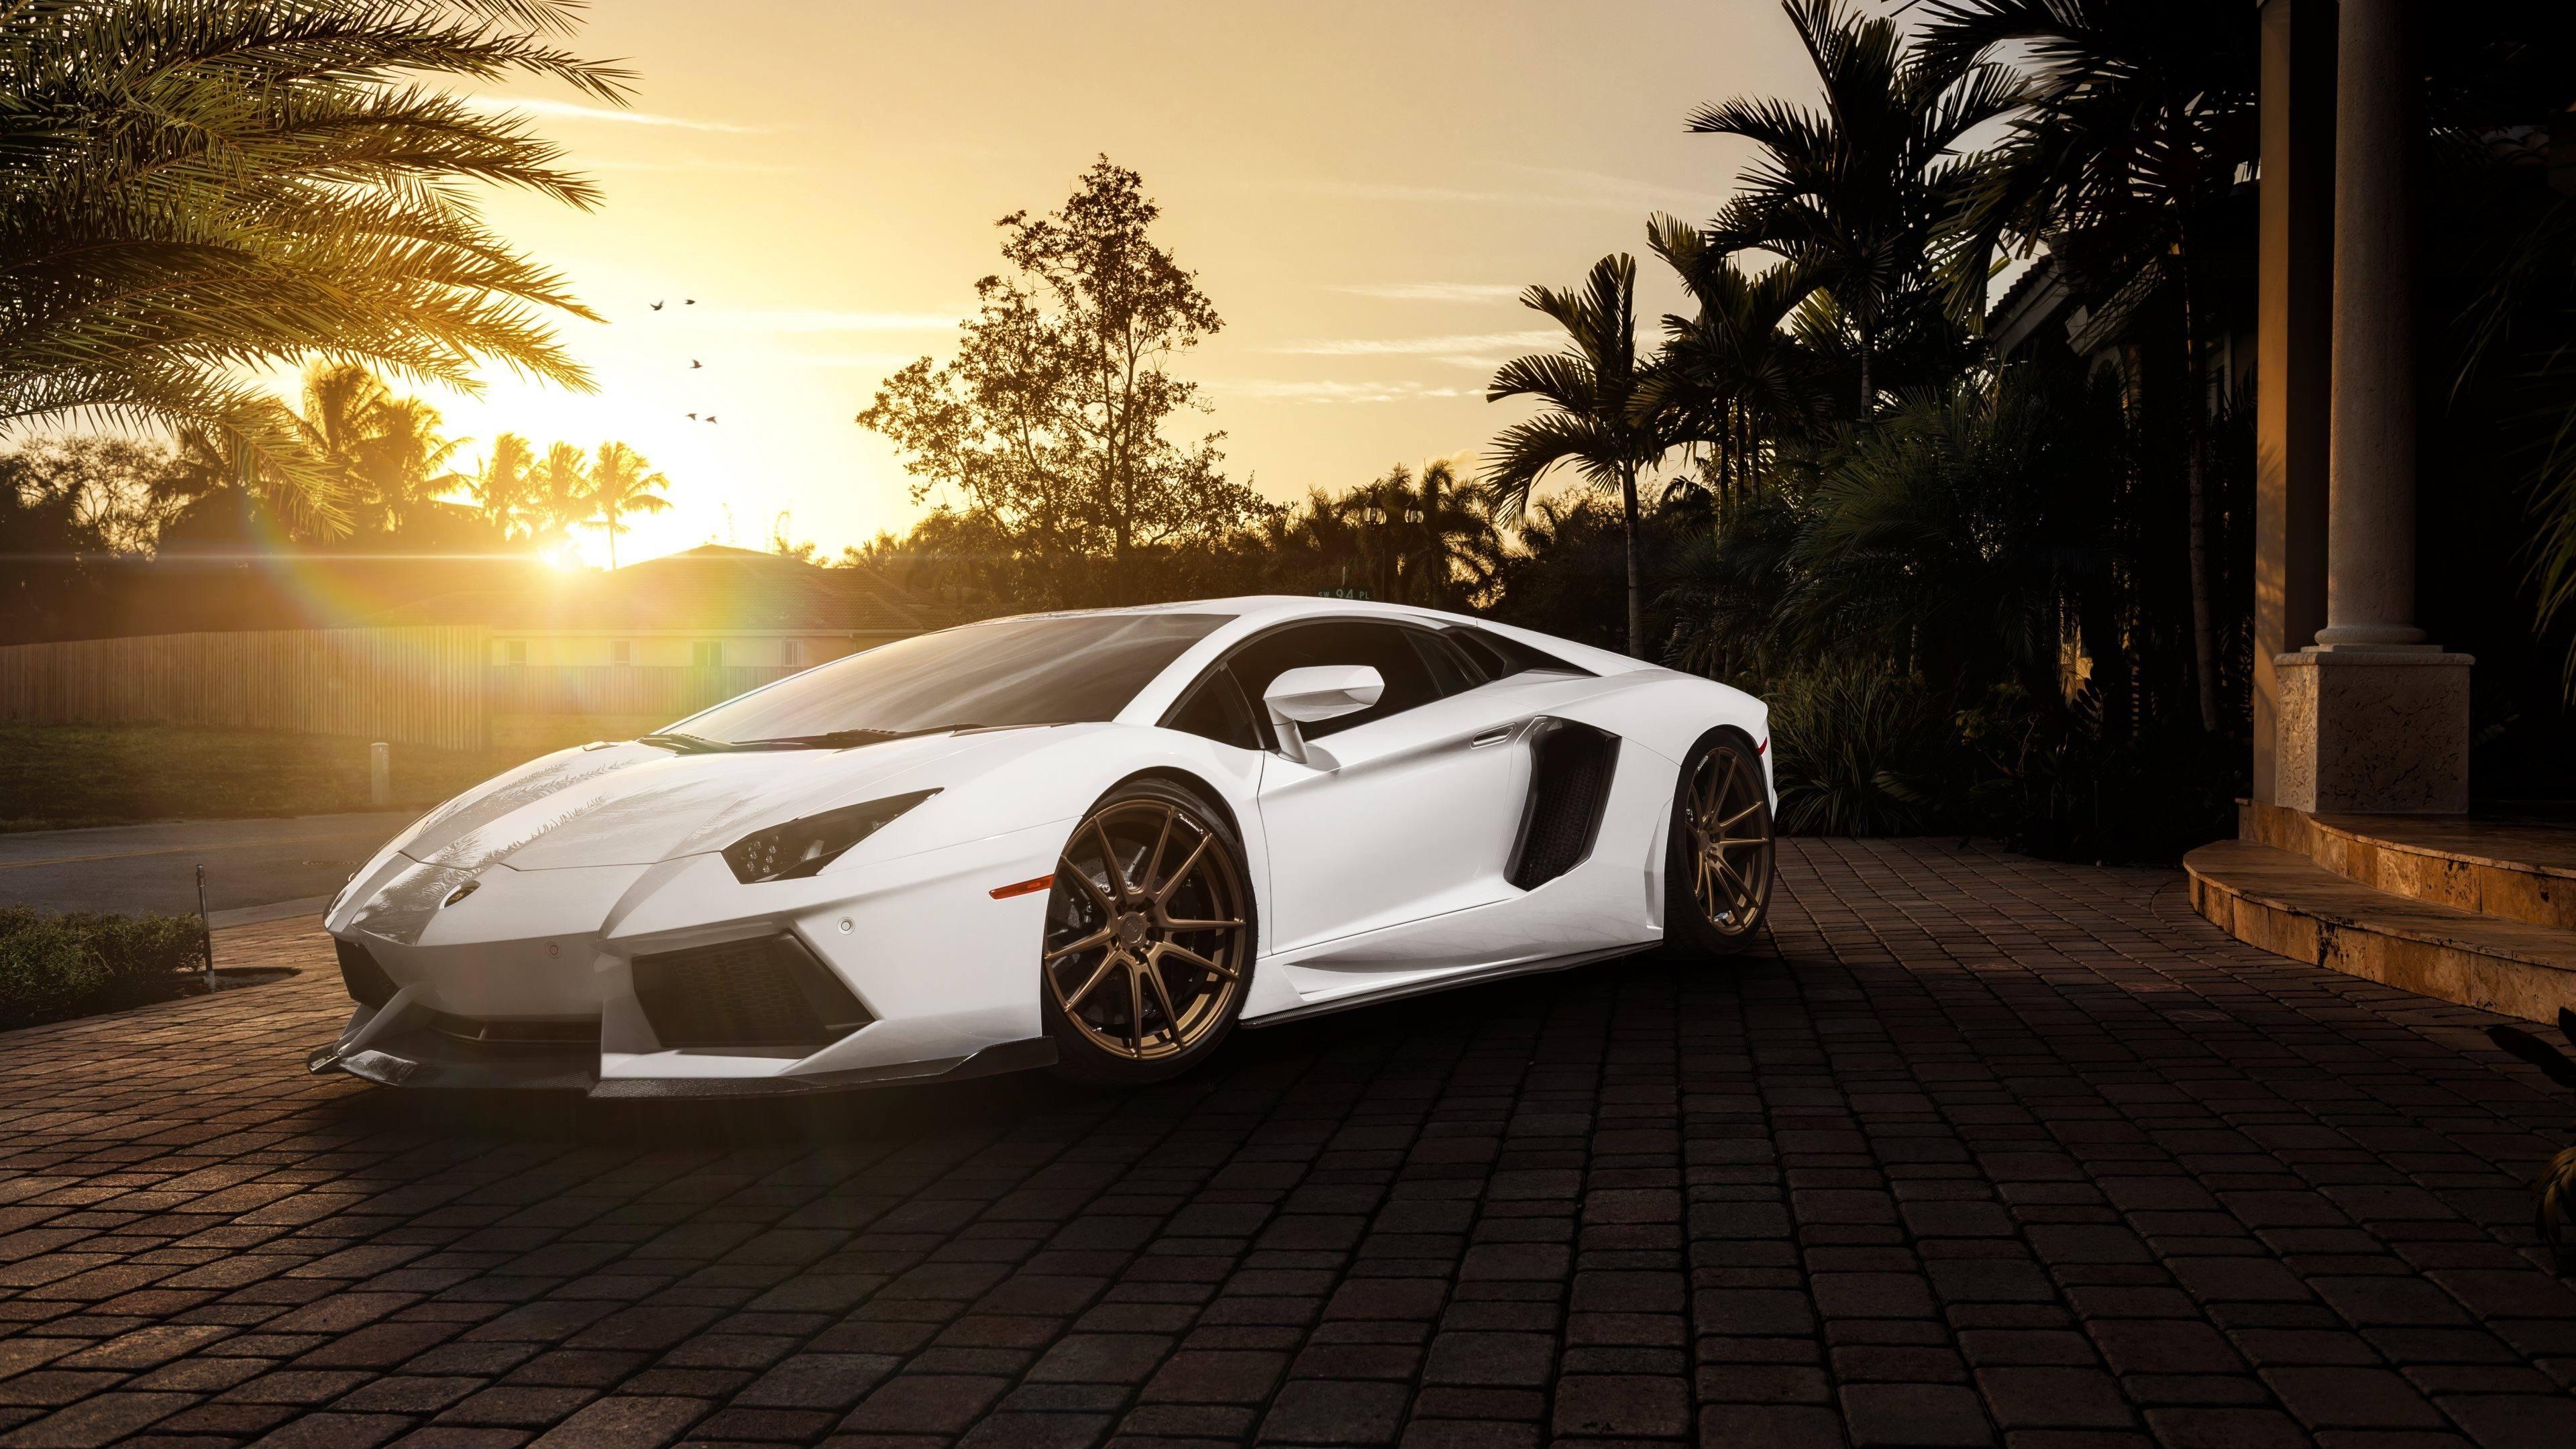 9dbc82b10e770450afd4a054d26a004d Exciting Lamborghini Huracán Lp 610-4 Cena Cars Trend